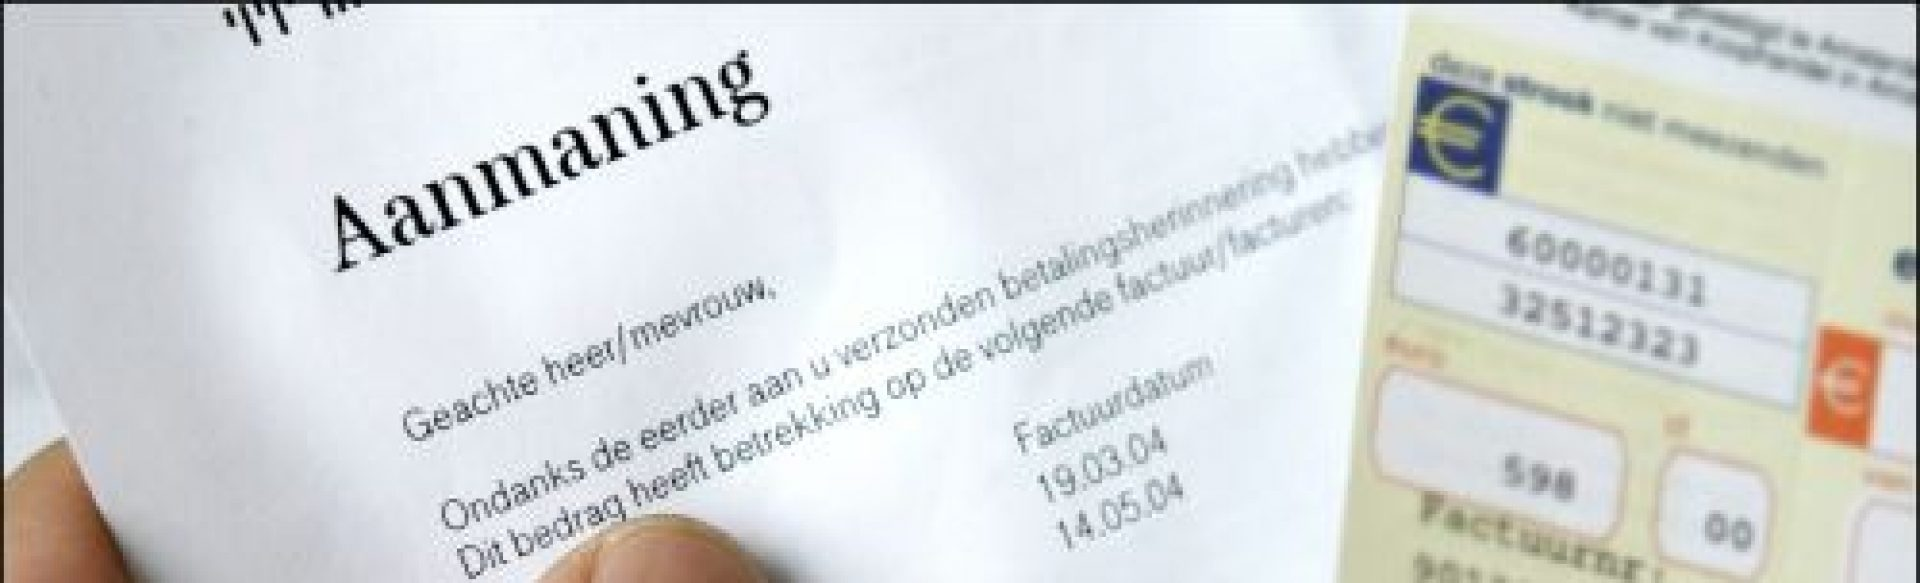 Schuldhulp Oost Nederland